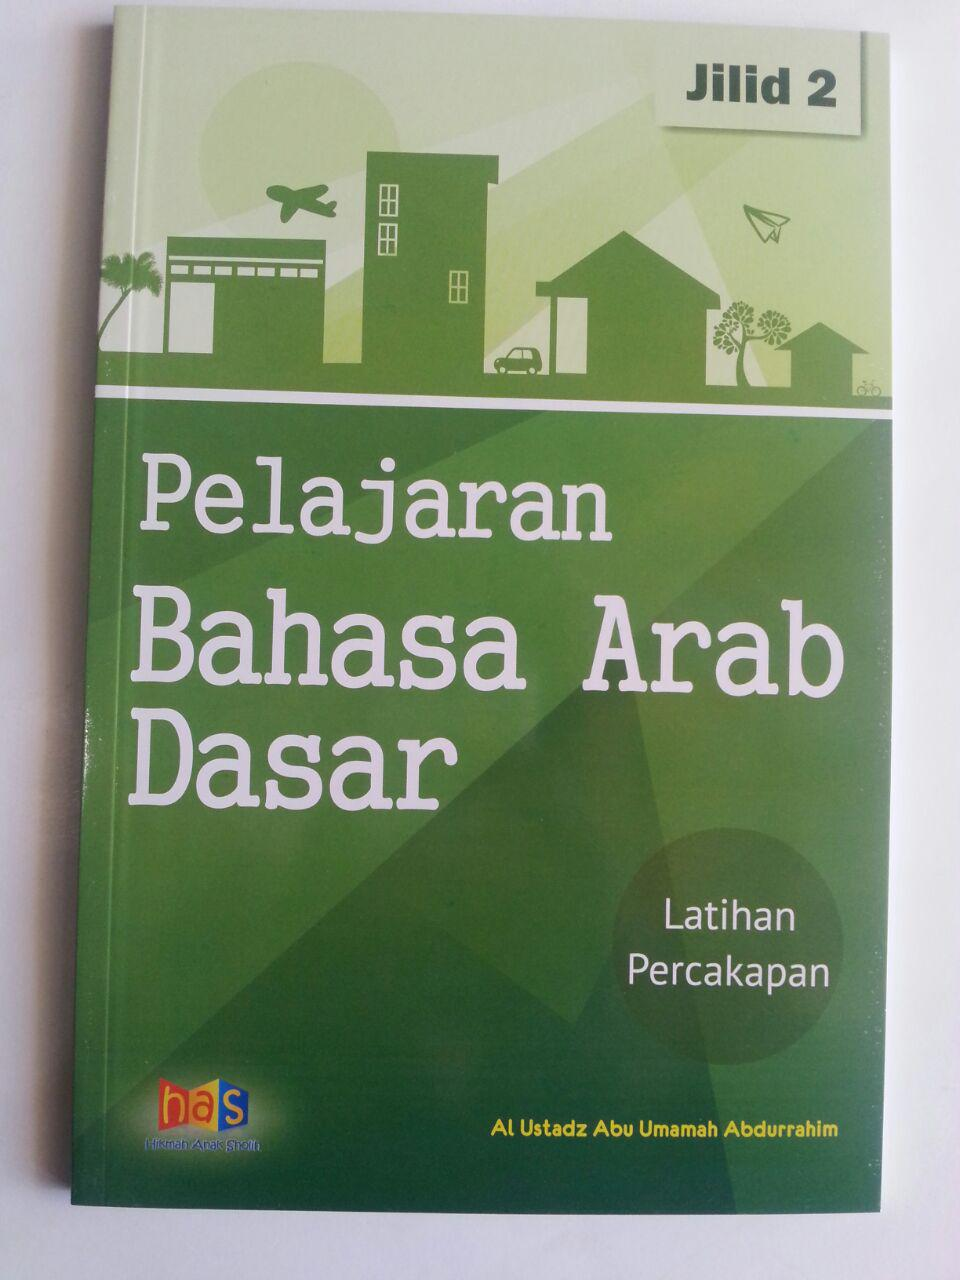 Buku Pelajaran Bahasa Arab Dasar 2 Latihan Percakapan cover 2